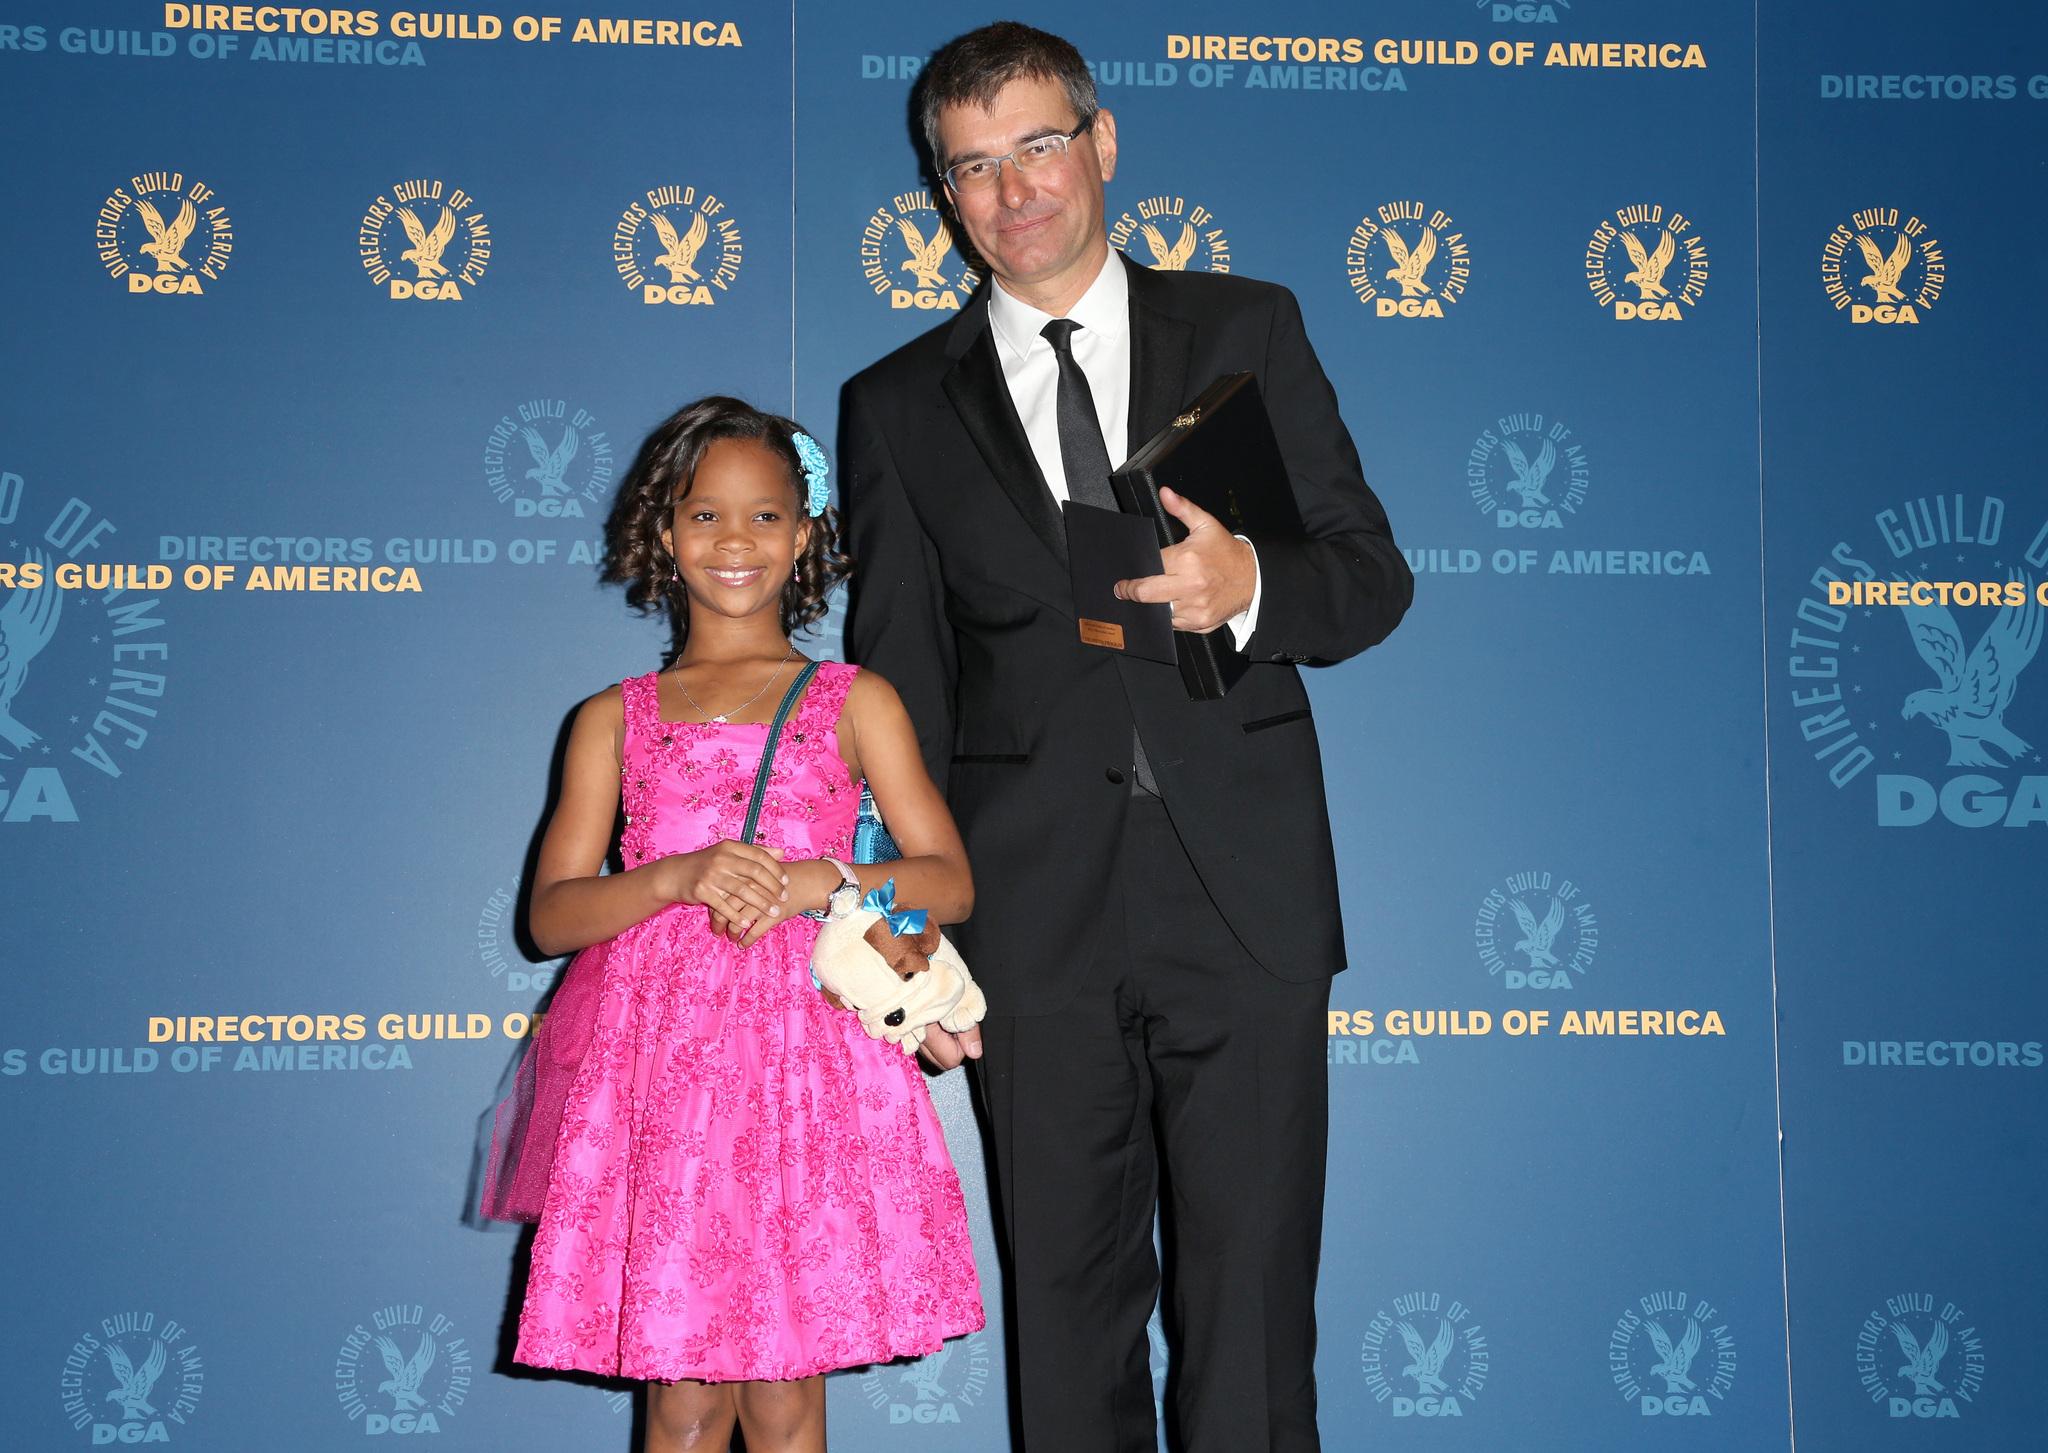 Directors Guild of America, USA (2016) - IMDb